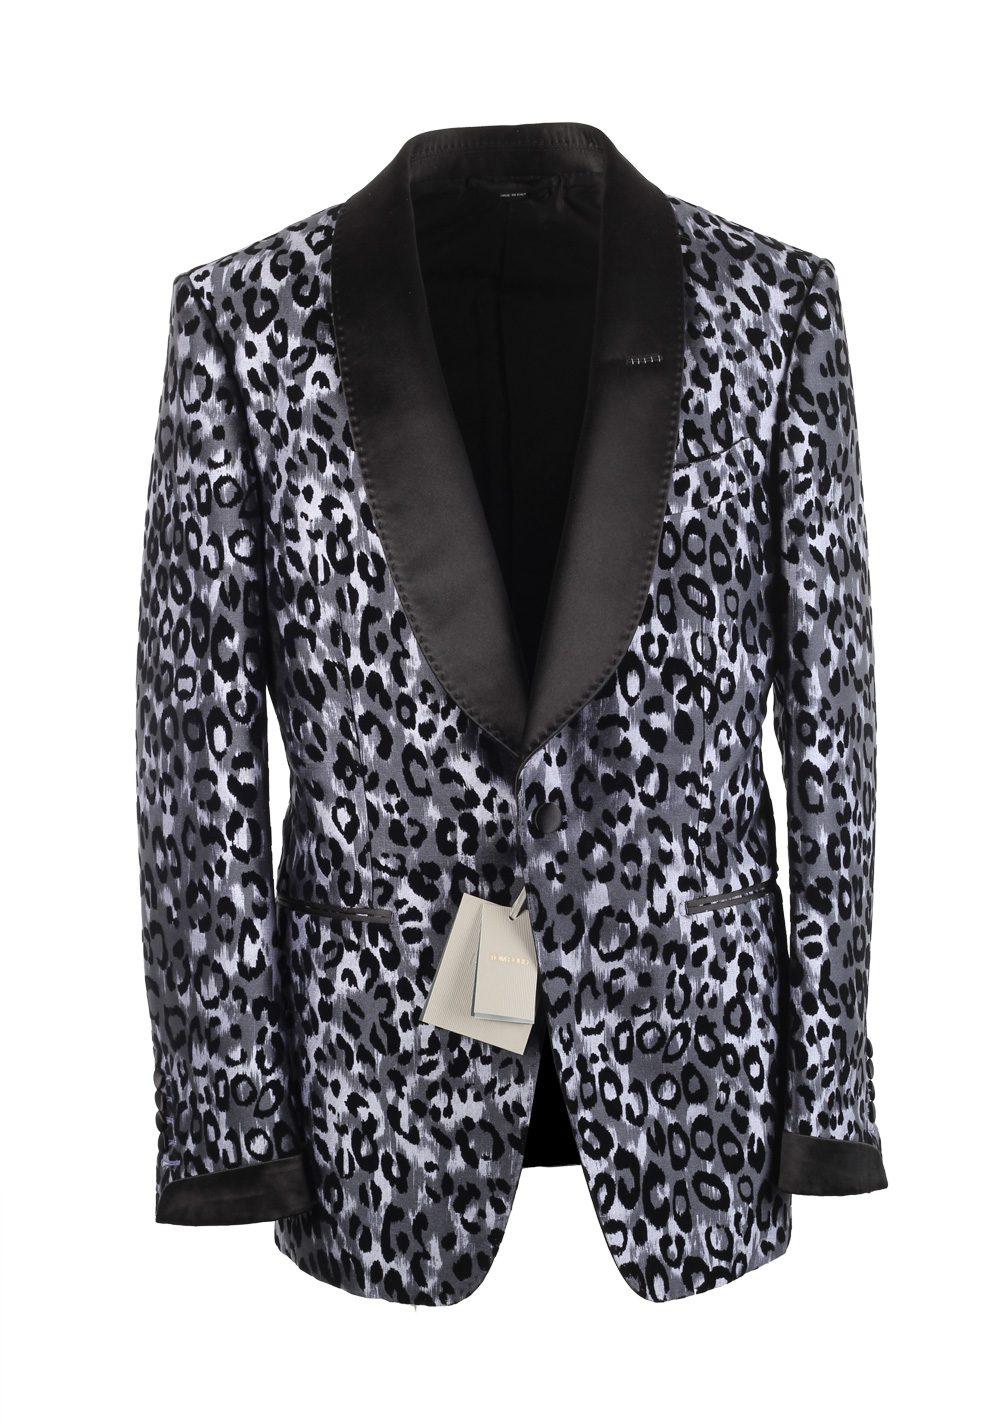 TOM FORD Shelton Leopard Tuxedo Dinner Jacket Size 48 / 38R U.S. In Silk   Costume Limité